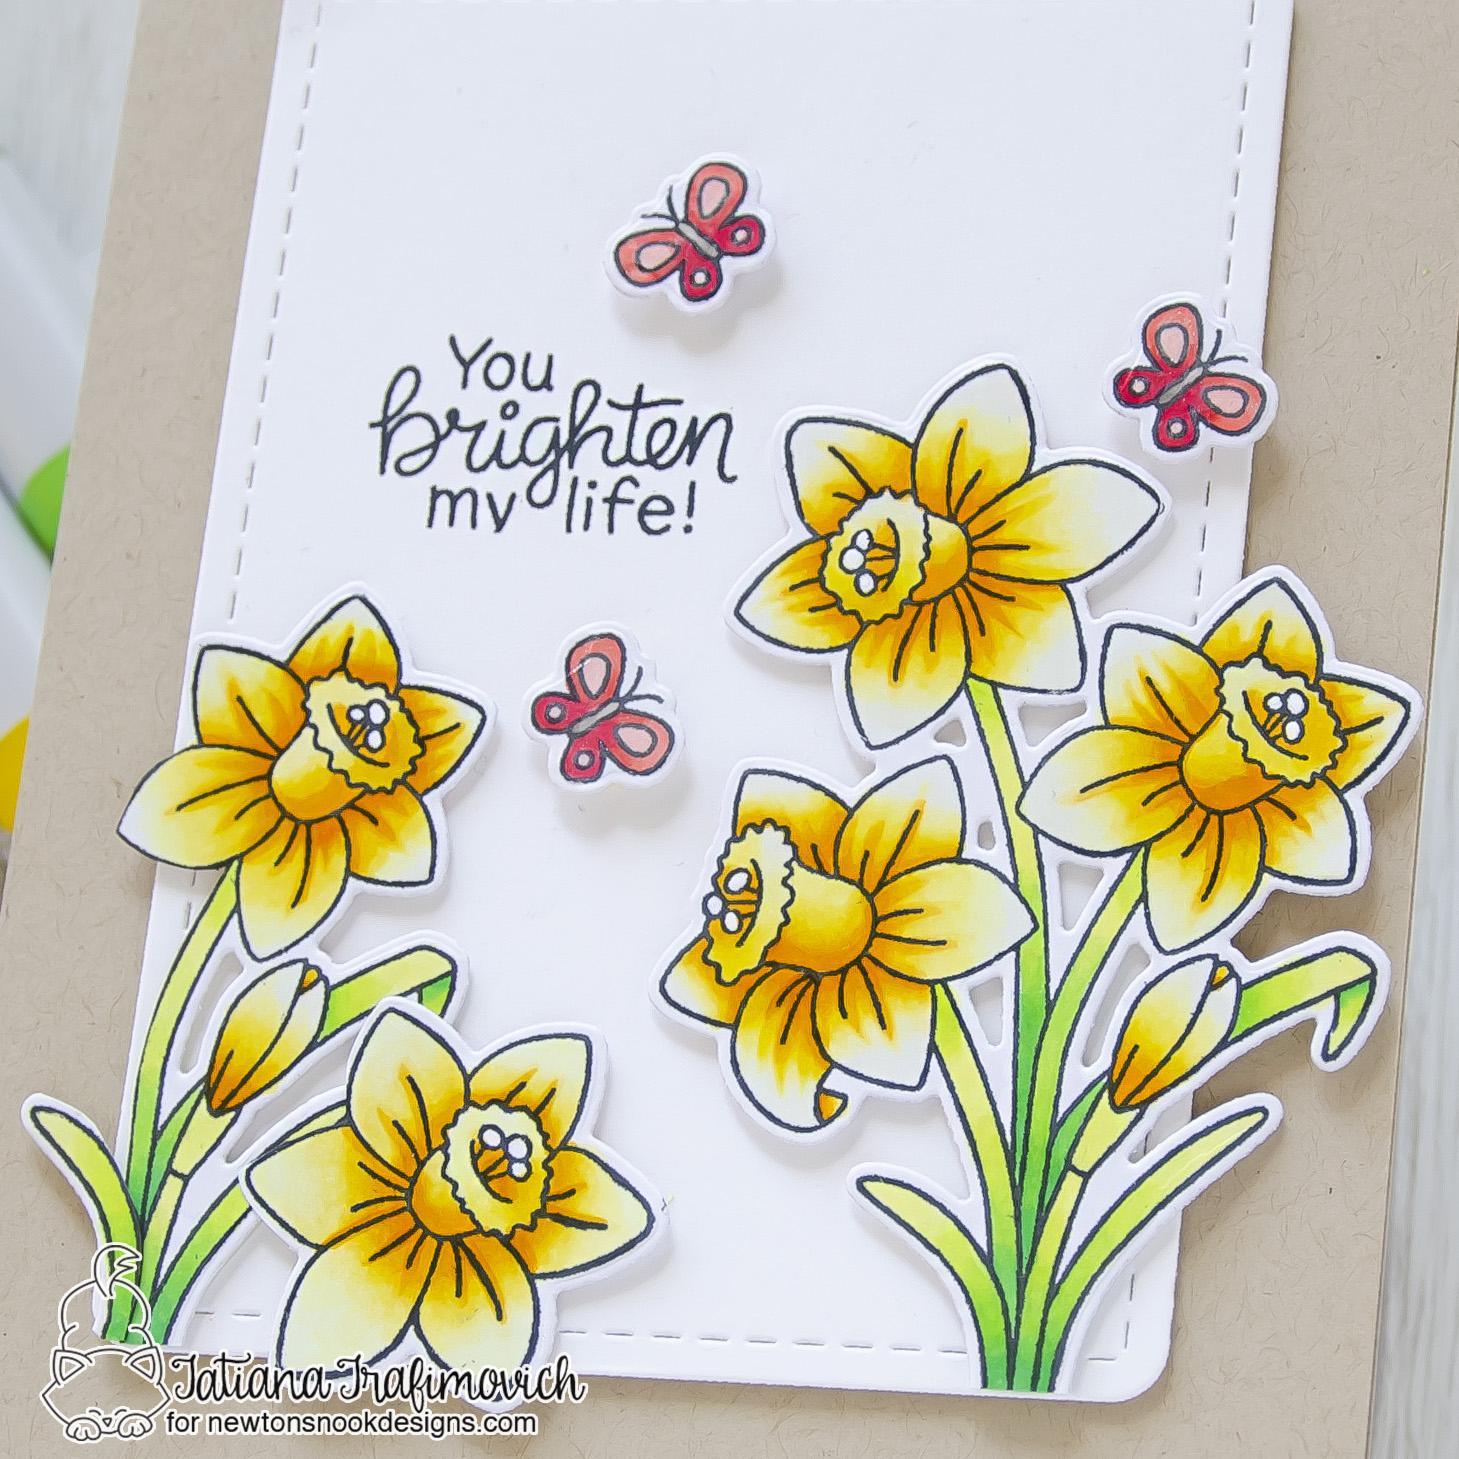 You Brighten My Life! #handmade card by Tatiana Trafimovich #tatianacraftandart - Daffodils stamp set by Newton's Nook Designs #newtonsnook